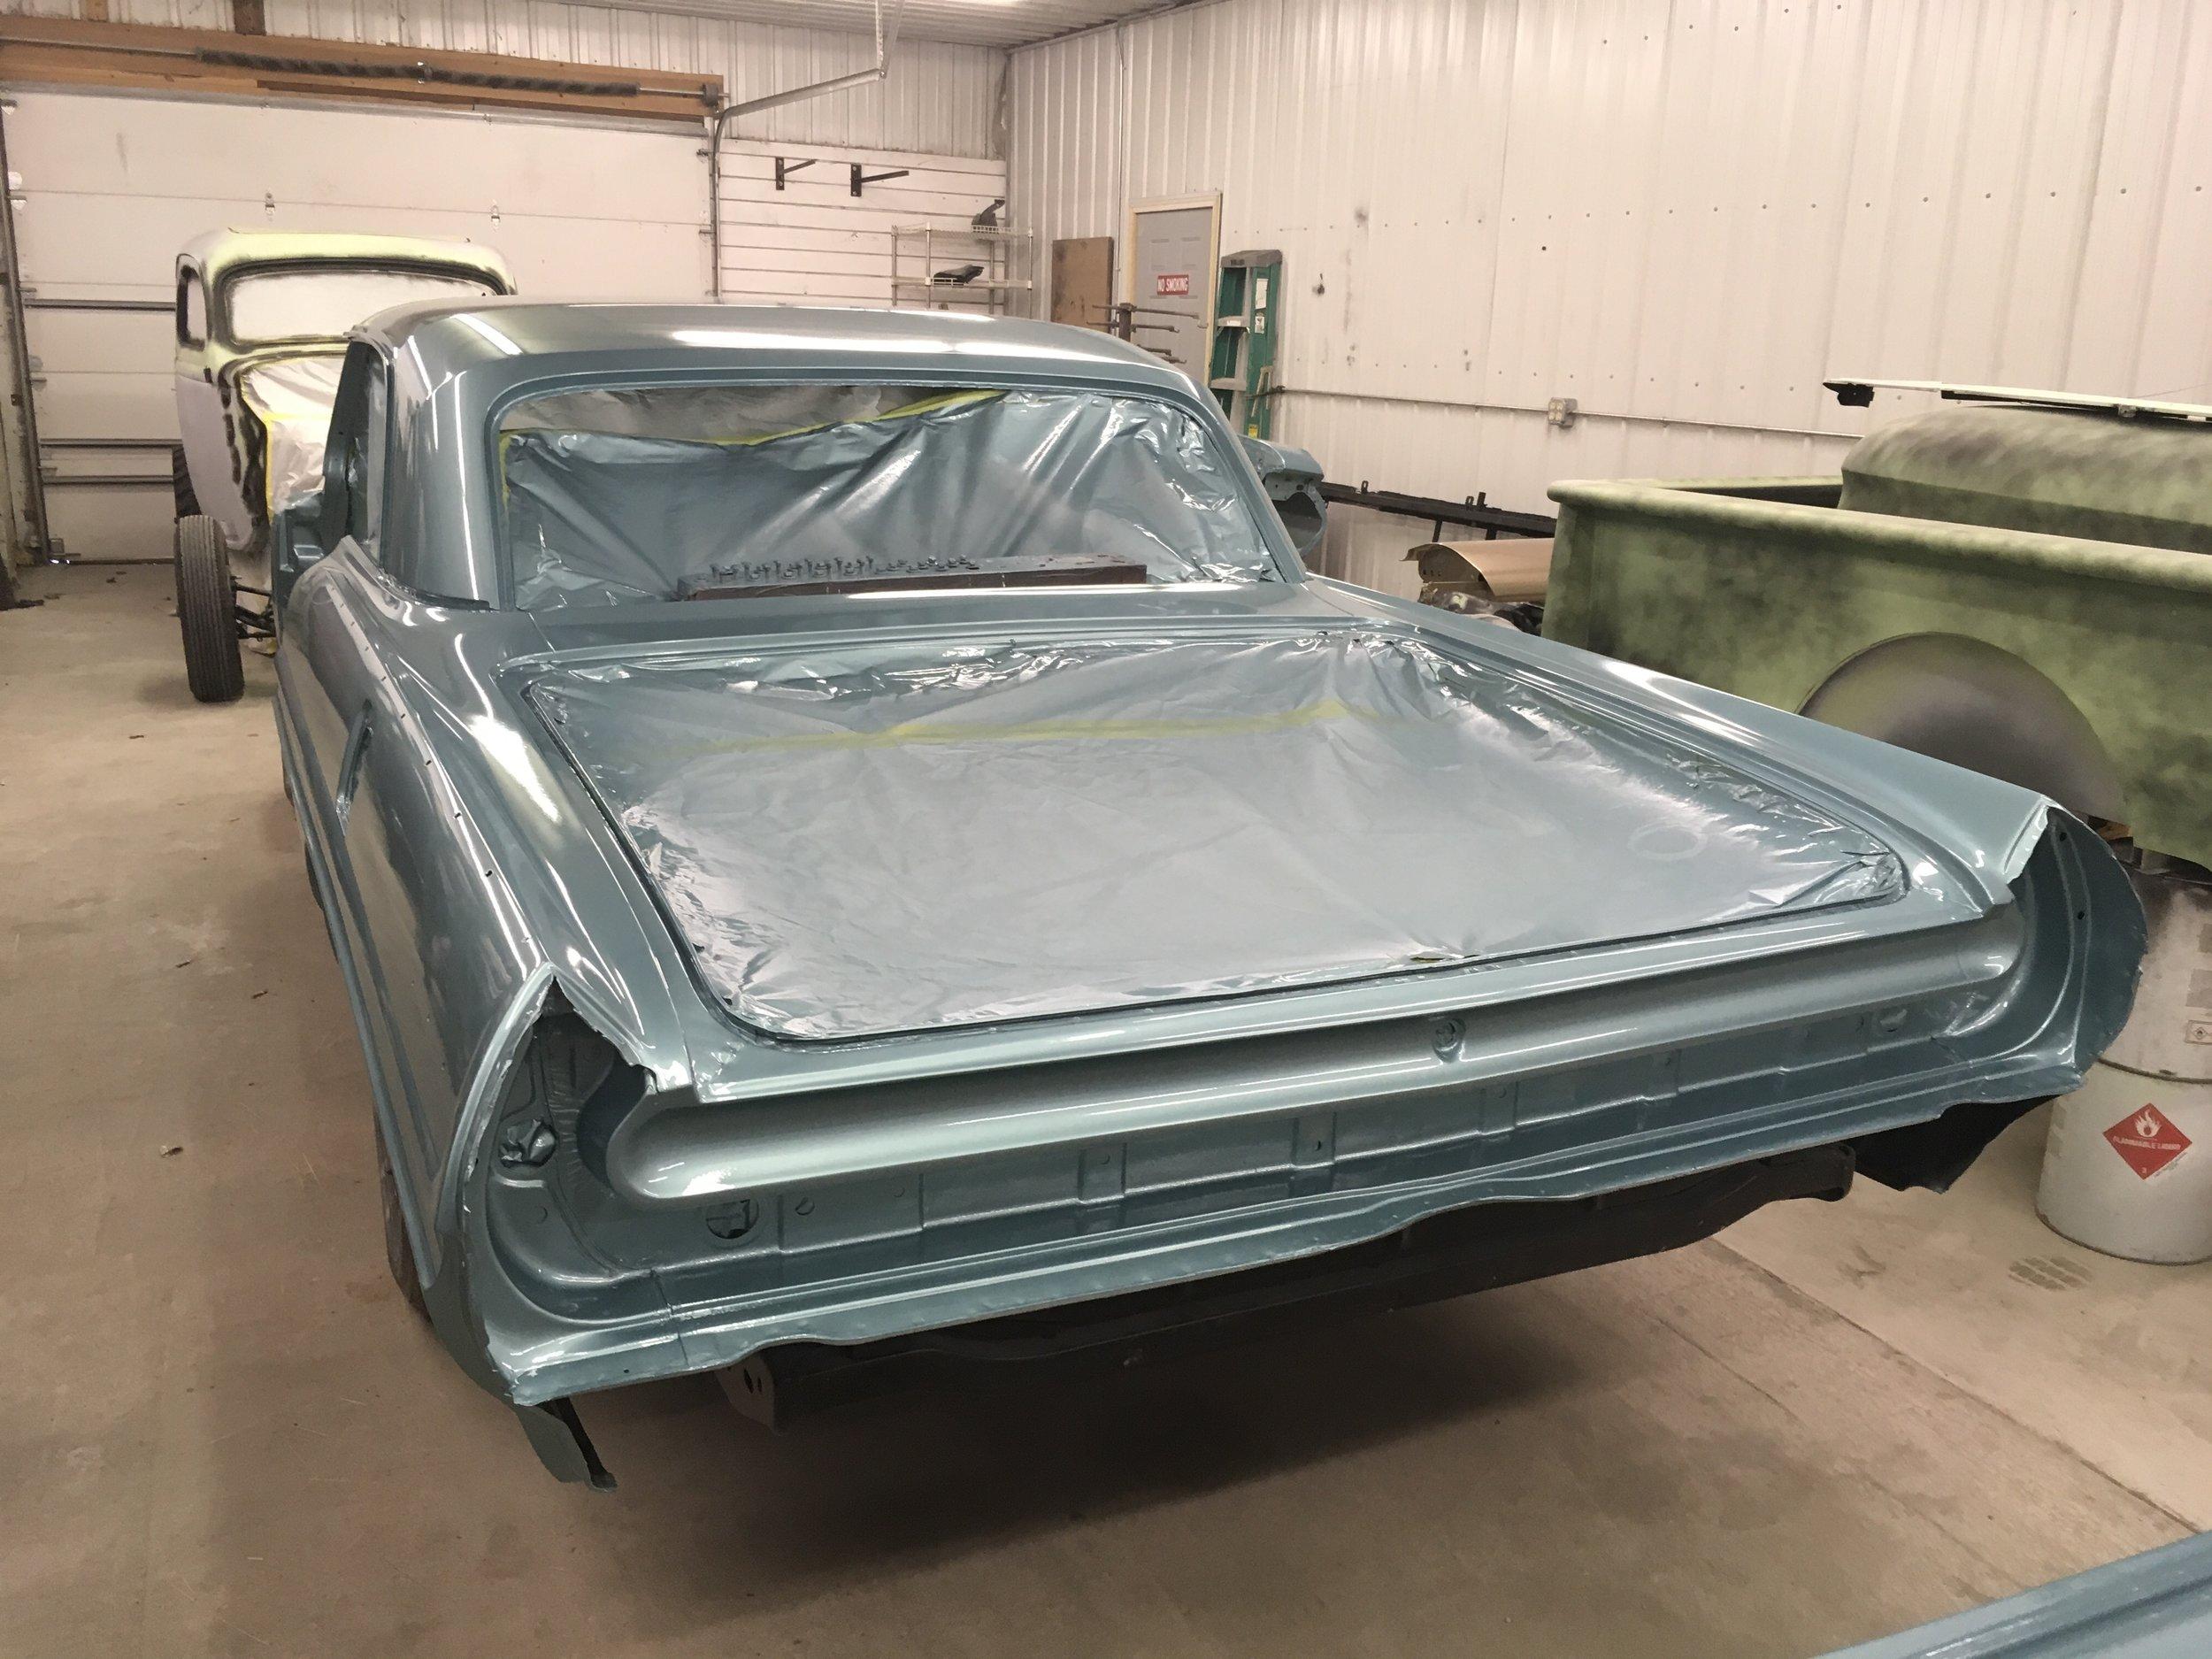 1962-pontiac-bonneville-minneapolis-hot-rod-custom-build-restoration-13.jpg